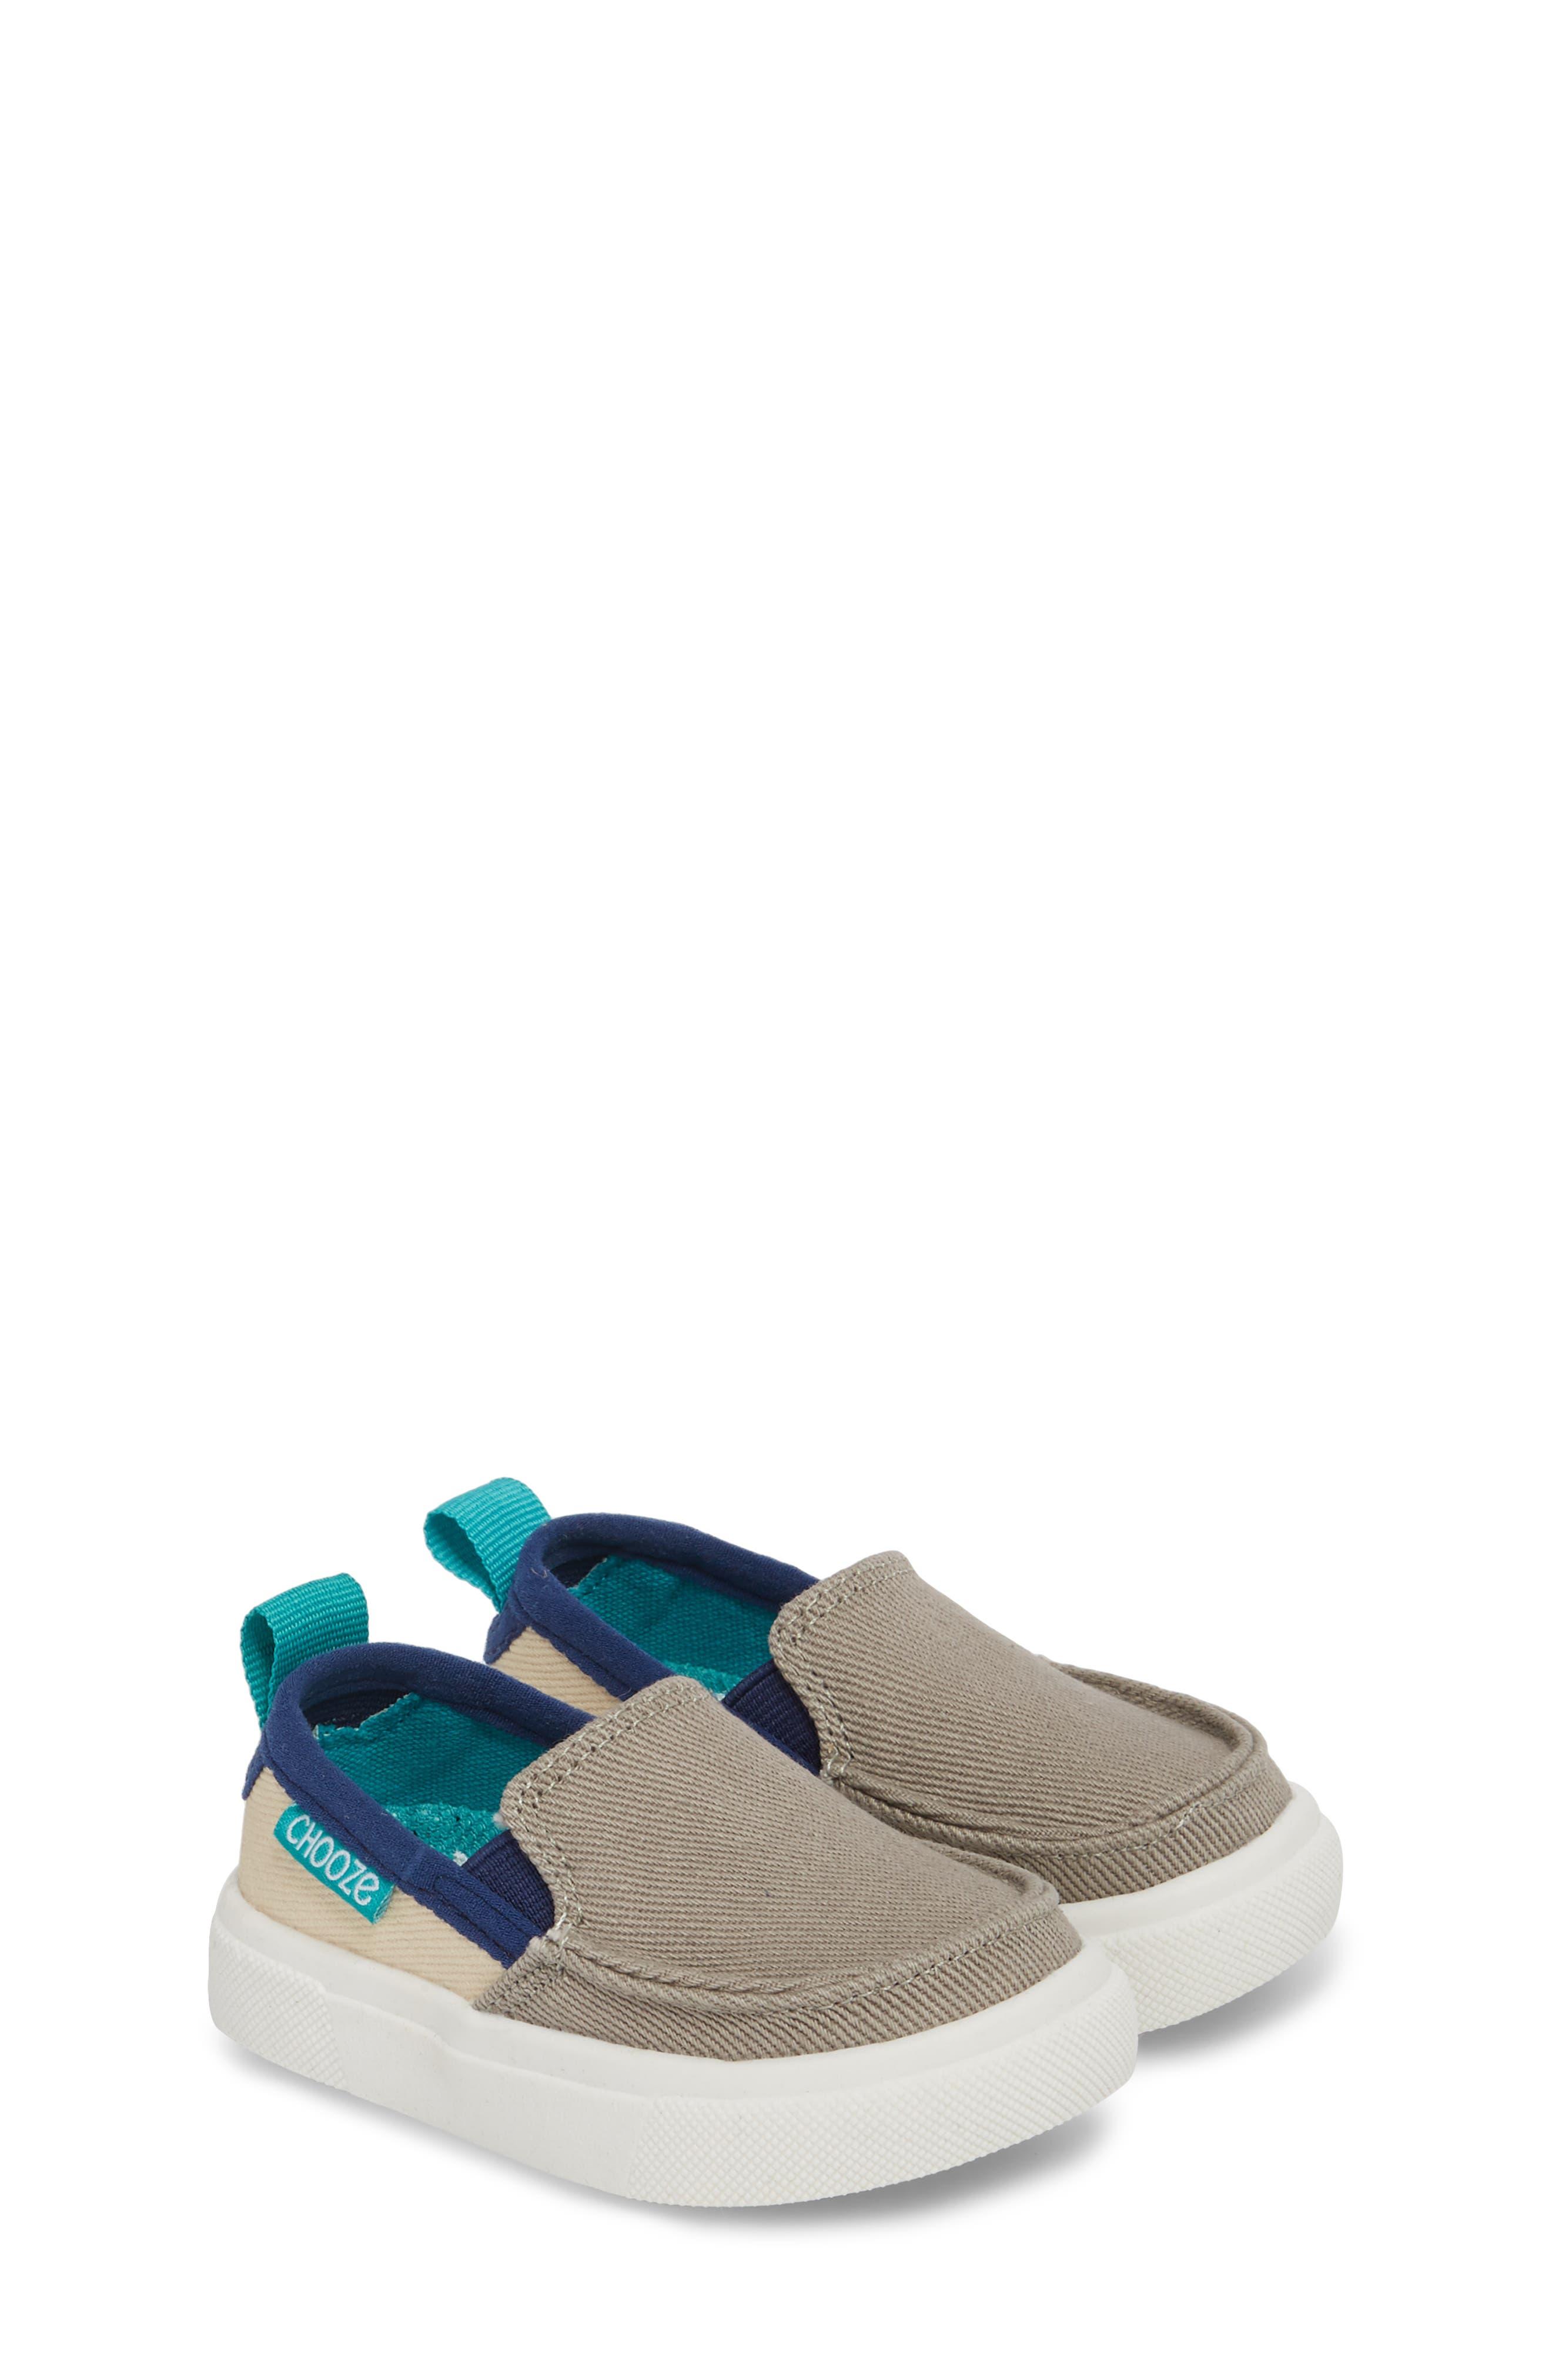 Roam Slip-On Sneaker,                             Main thumbnail 1, color,                             Earth